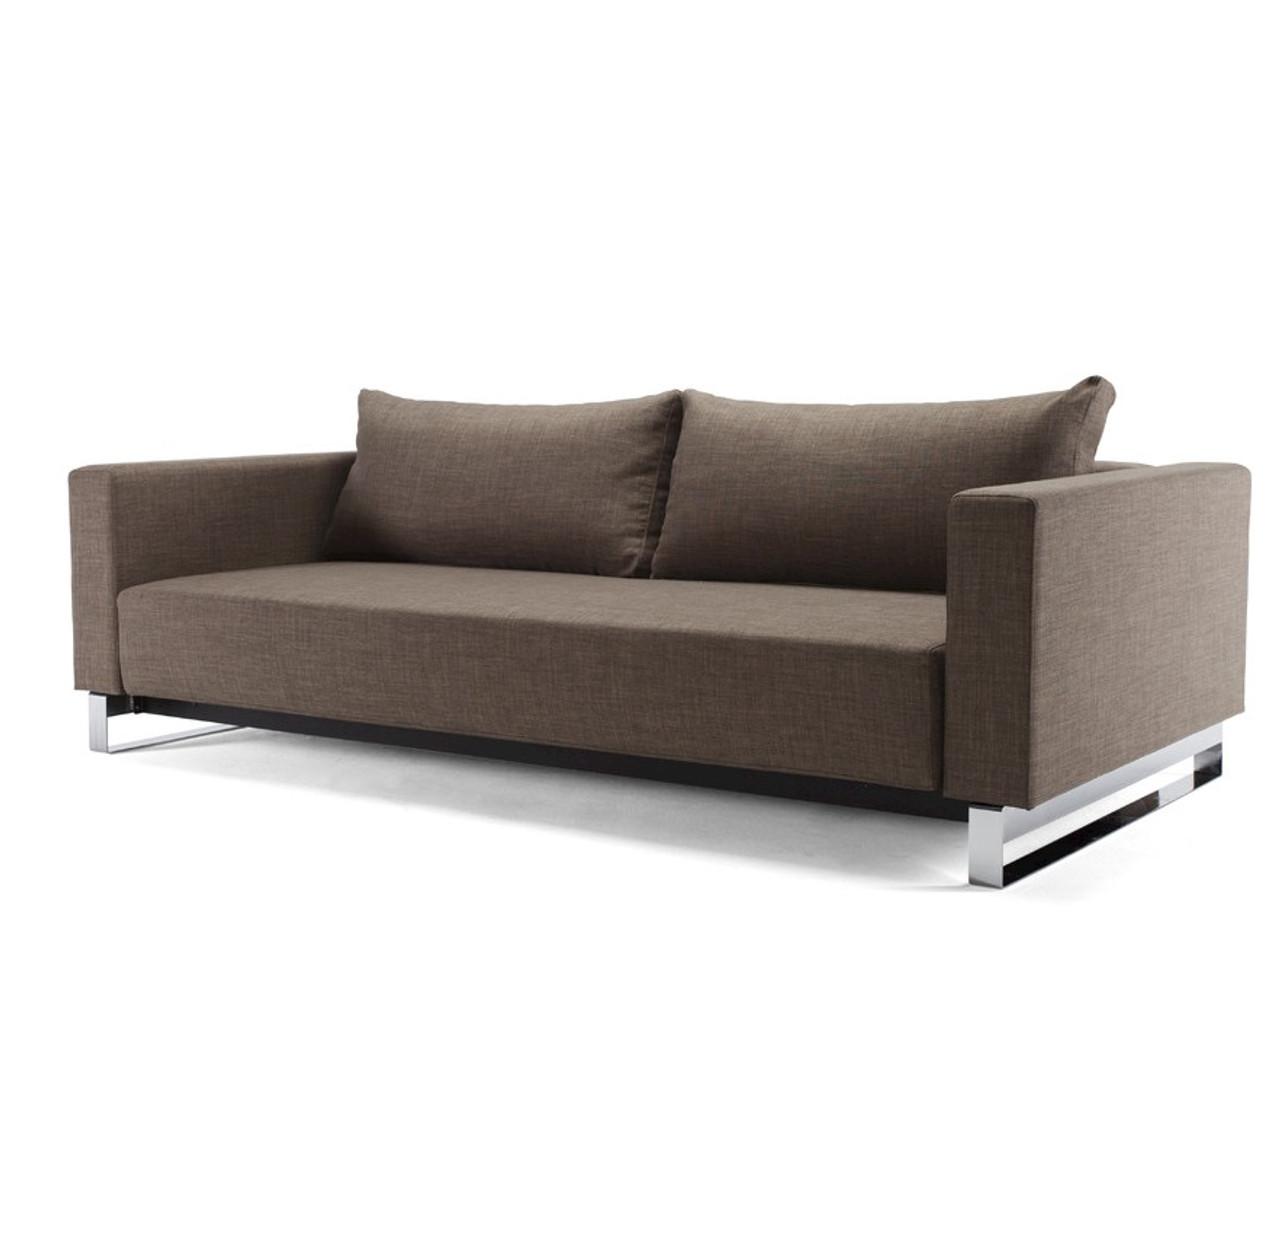 Superb Cassius Sleek Excess Sofa Bed Lounger Theyellowbook Wood Chair Design Ideas Theyellowbookinfo